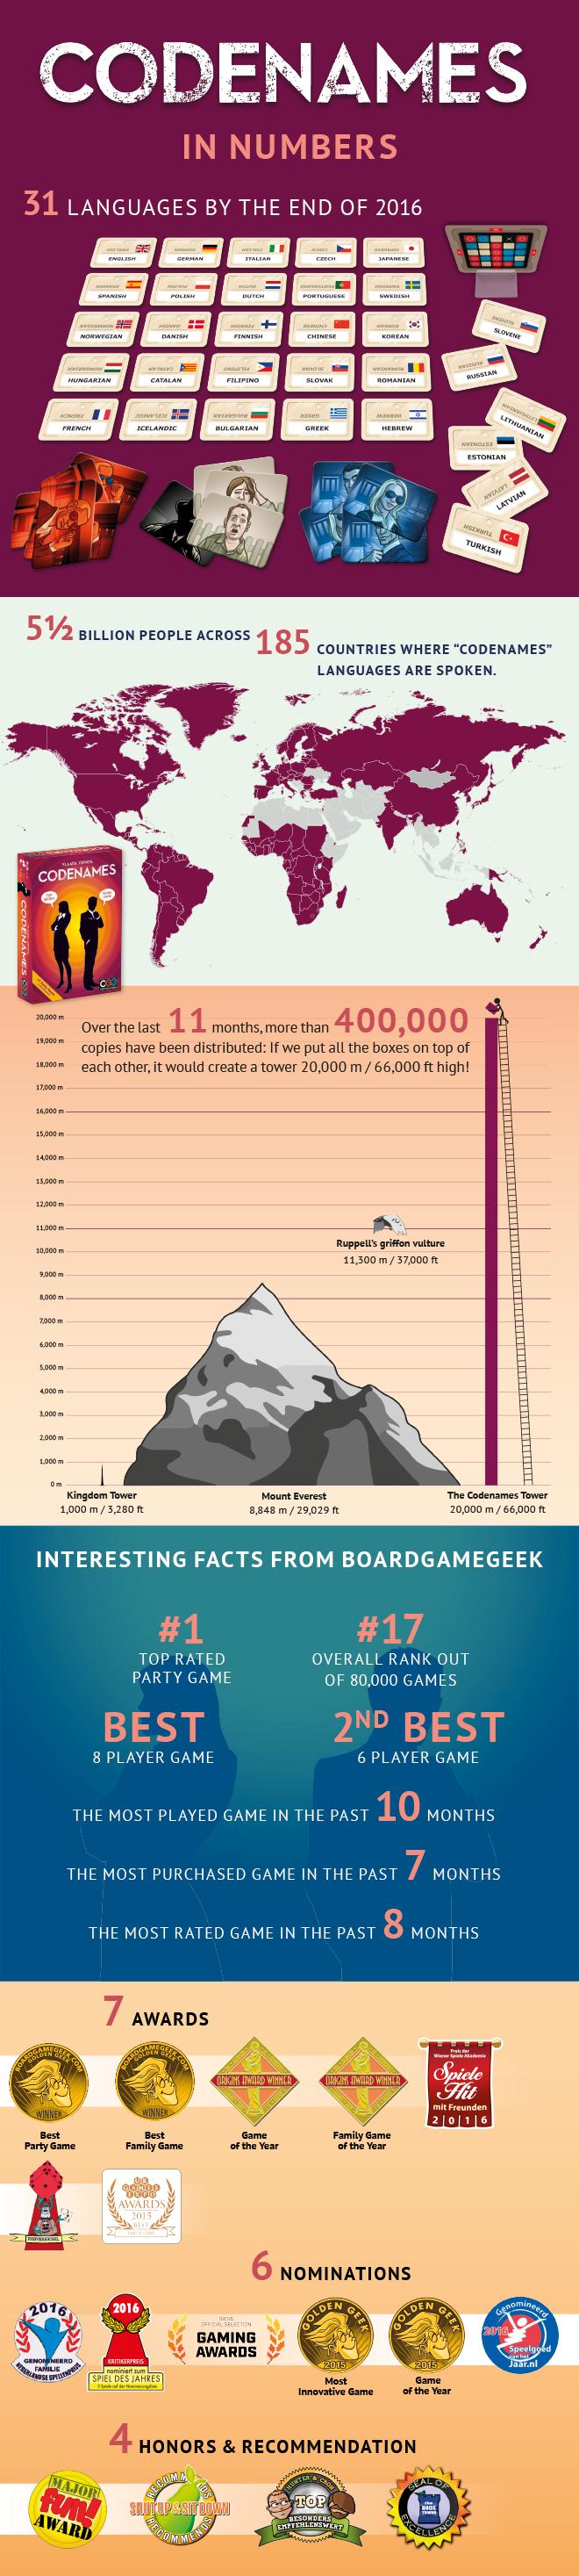 Codenames Summary Infographic